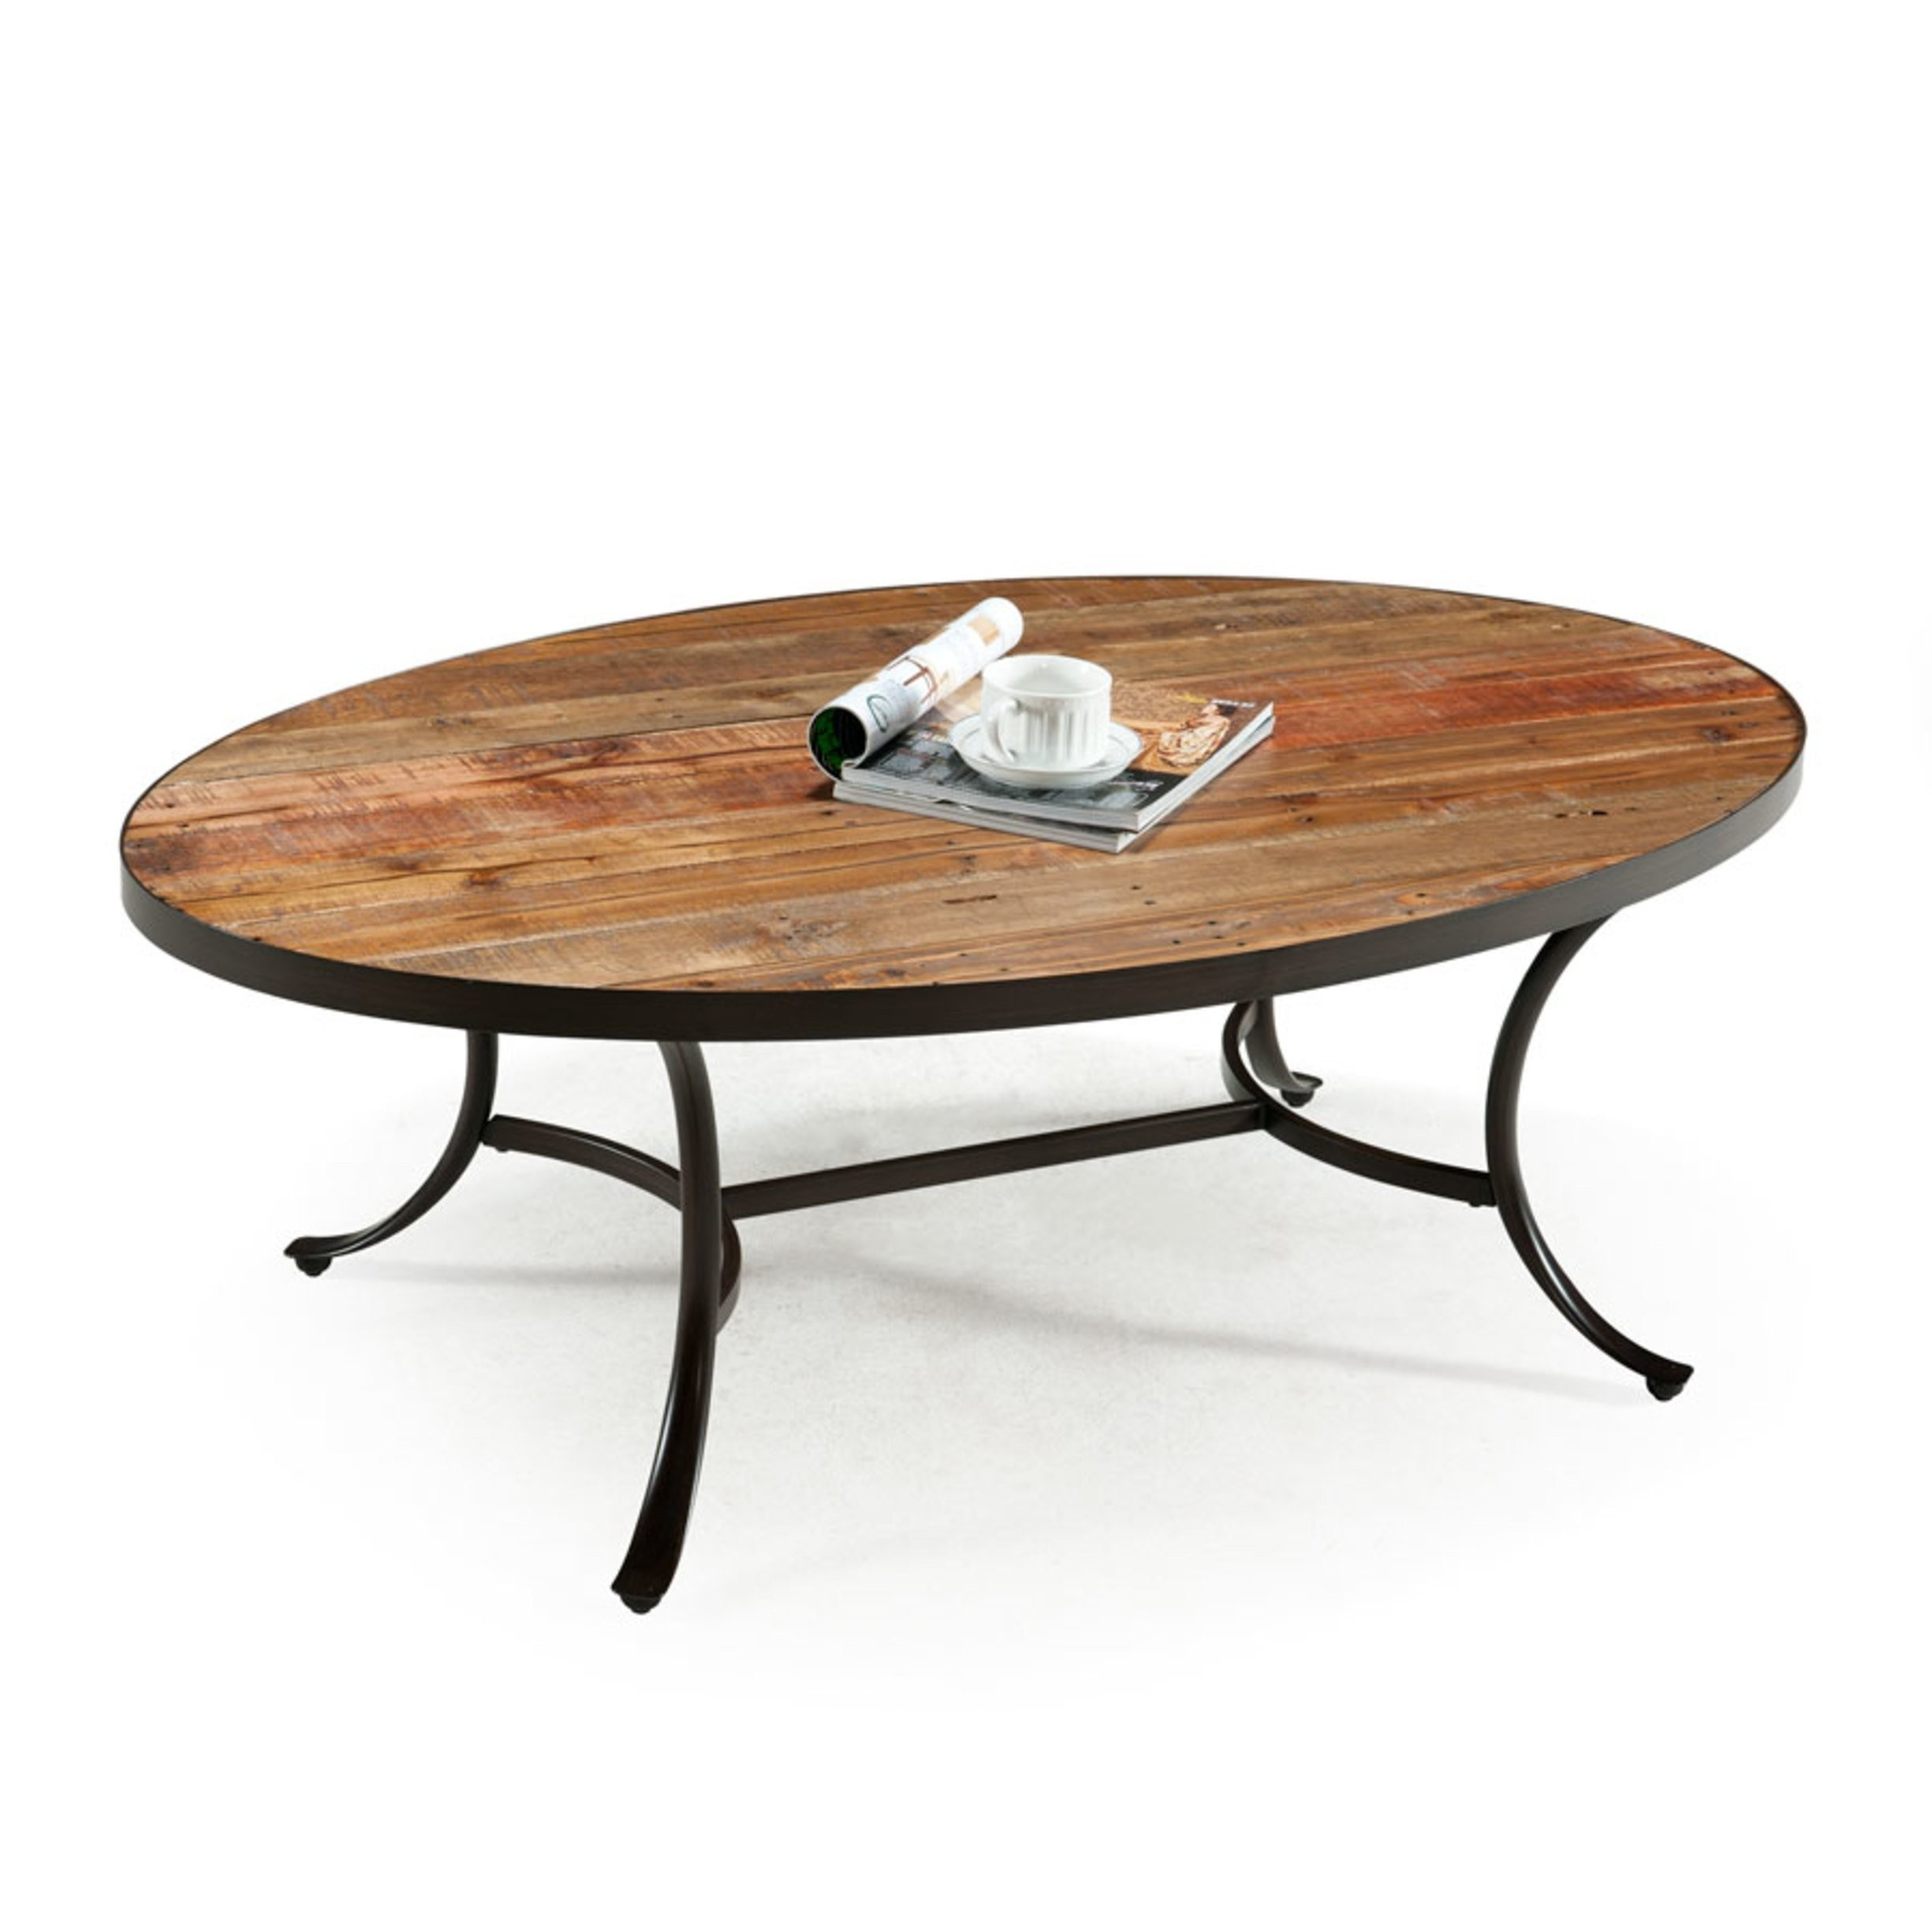 Merveilleux Iron Wood Coffee Table